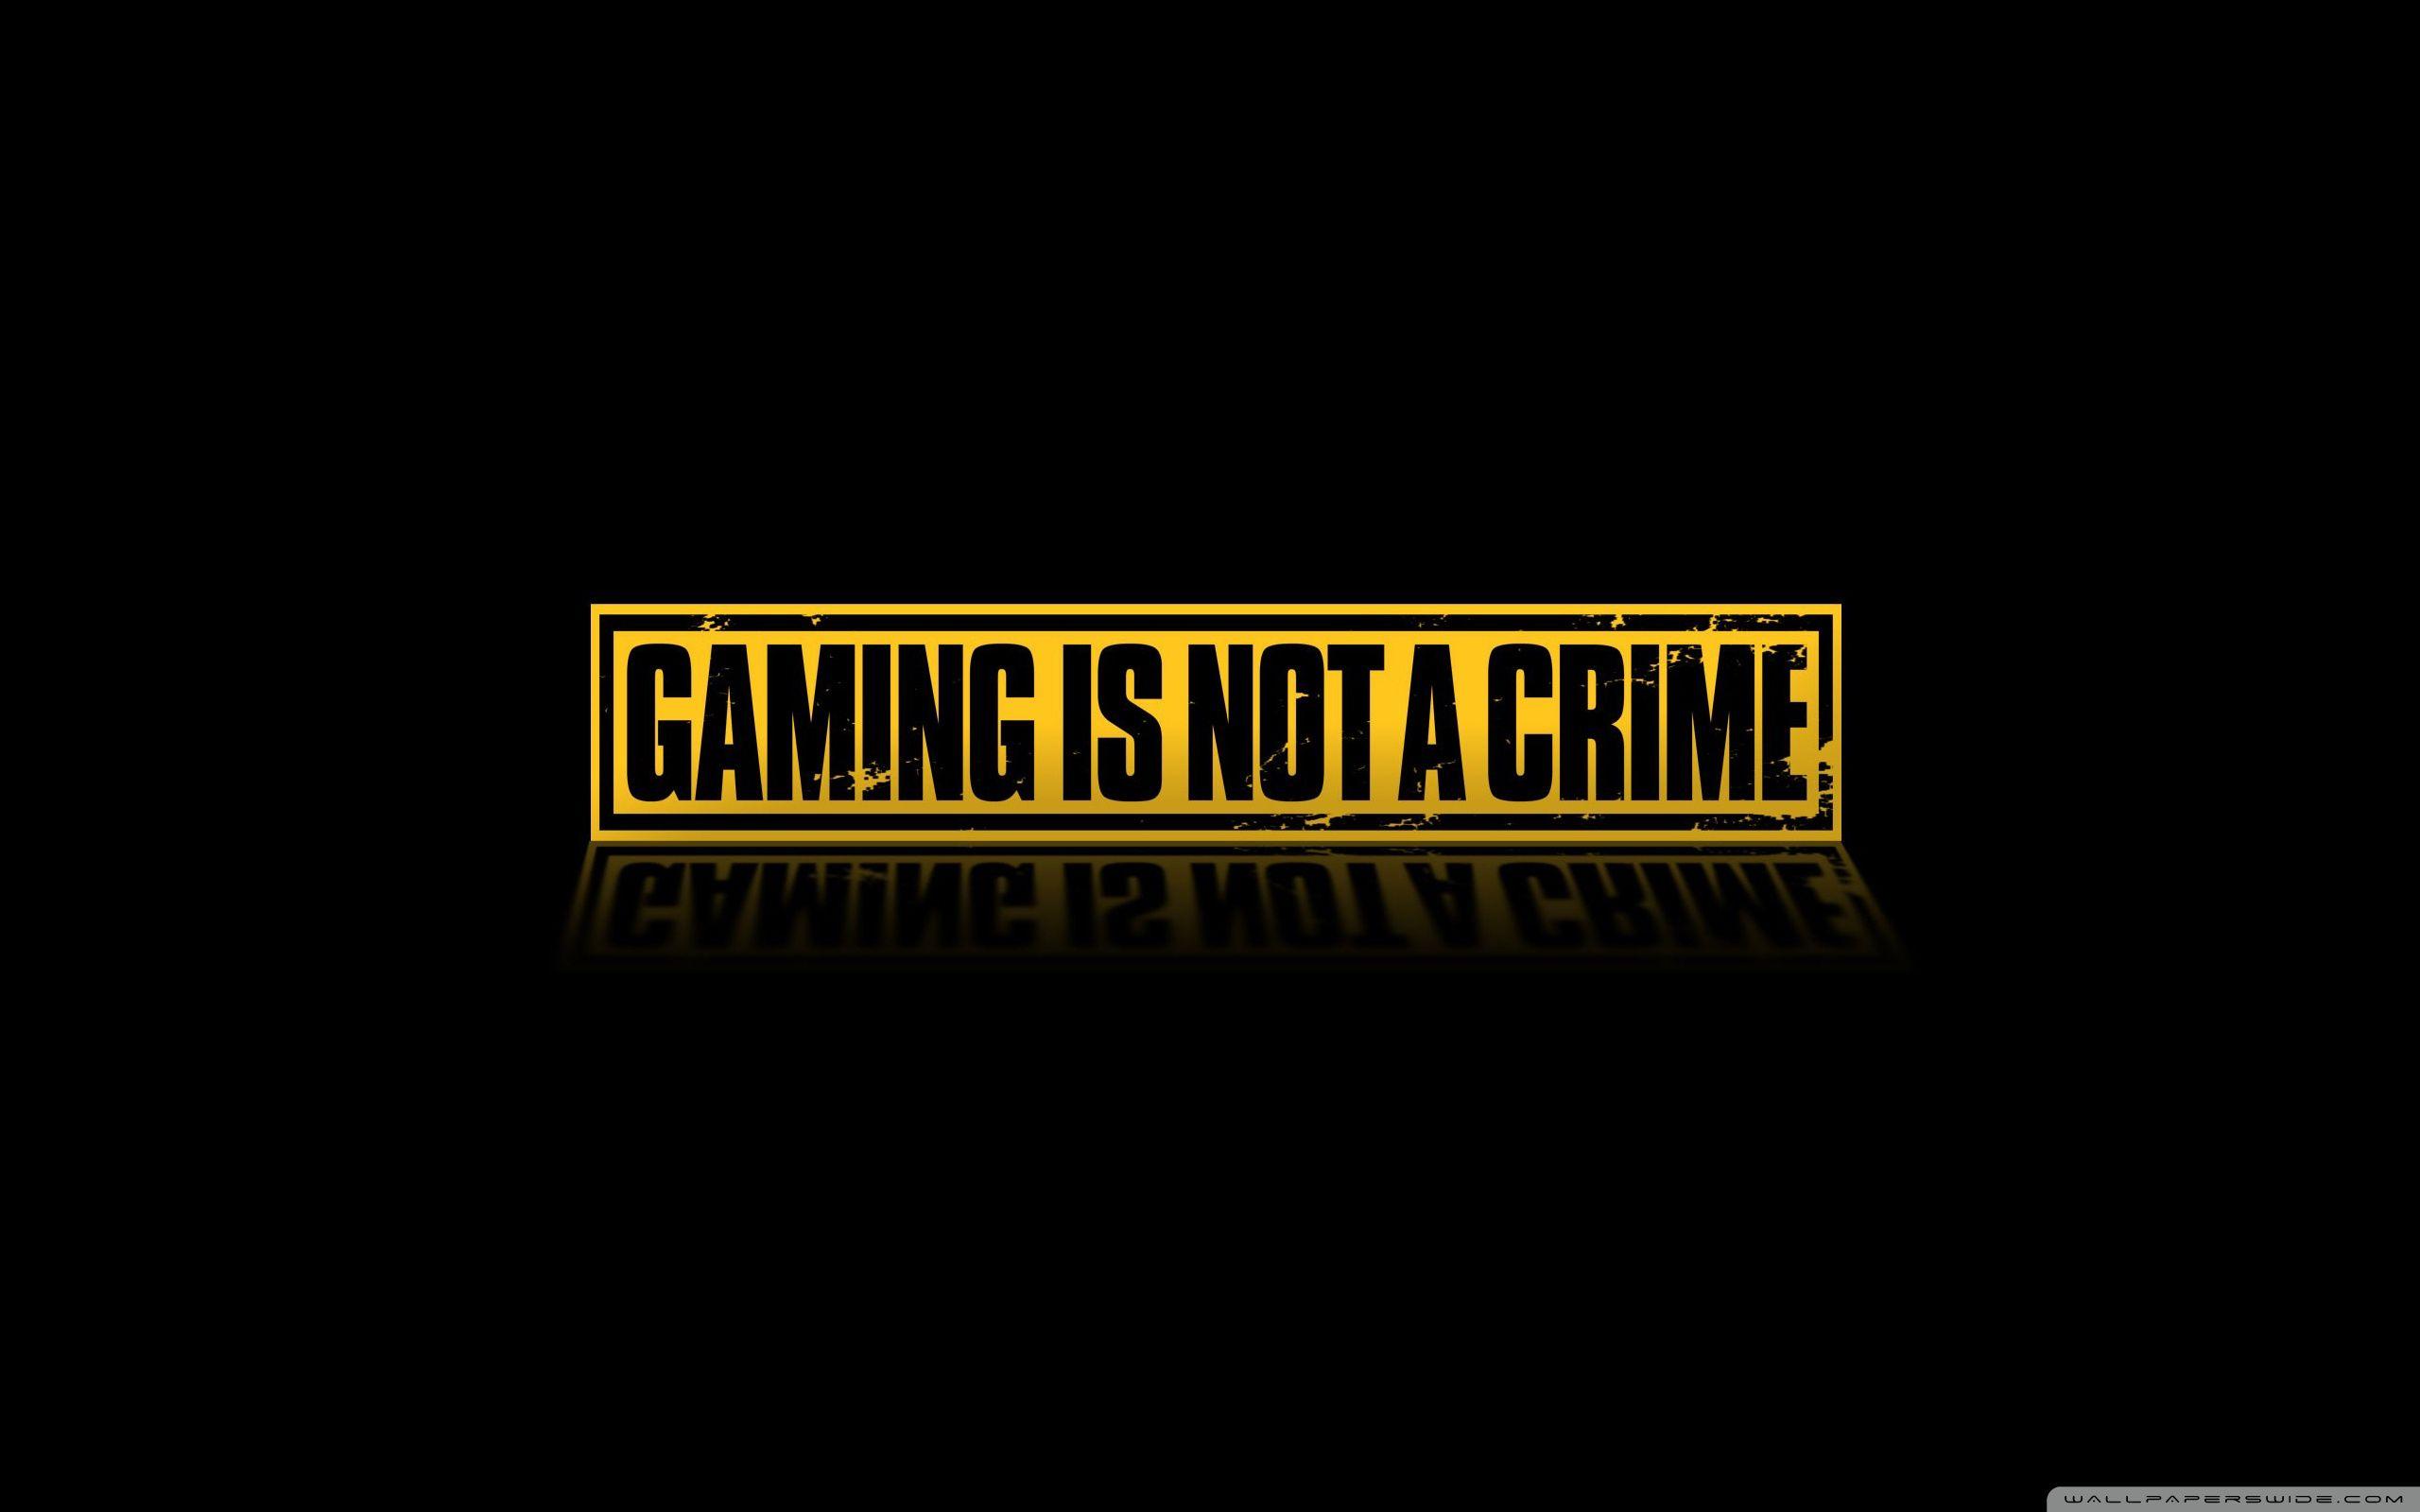 Gaming Is Not A Crime ❤ 4k Hd Desktop Wallpaper For - Desktop Gaming Wallpaper 4k , HD Wallpaper & Backgrounds